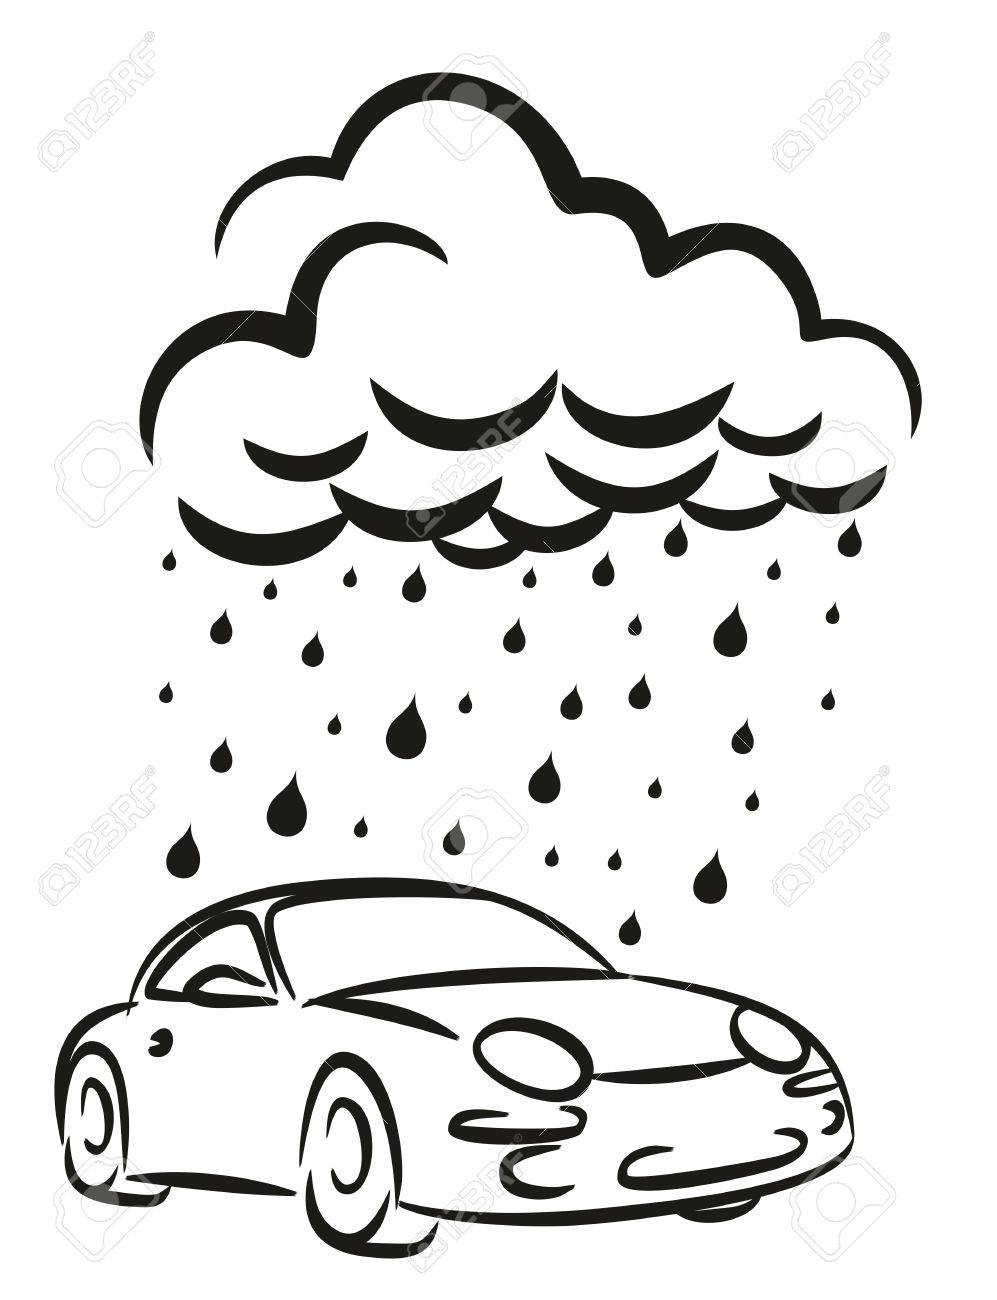 997x1300 A Logo Car Wash With Rainy Cloud. Royalty Free Cliparts, Vectors